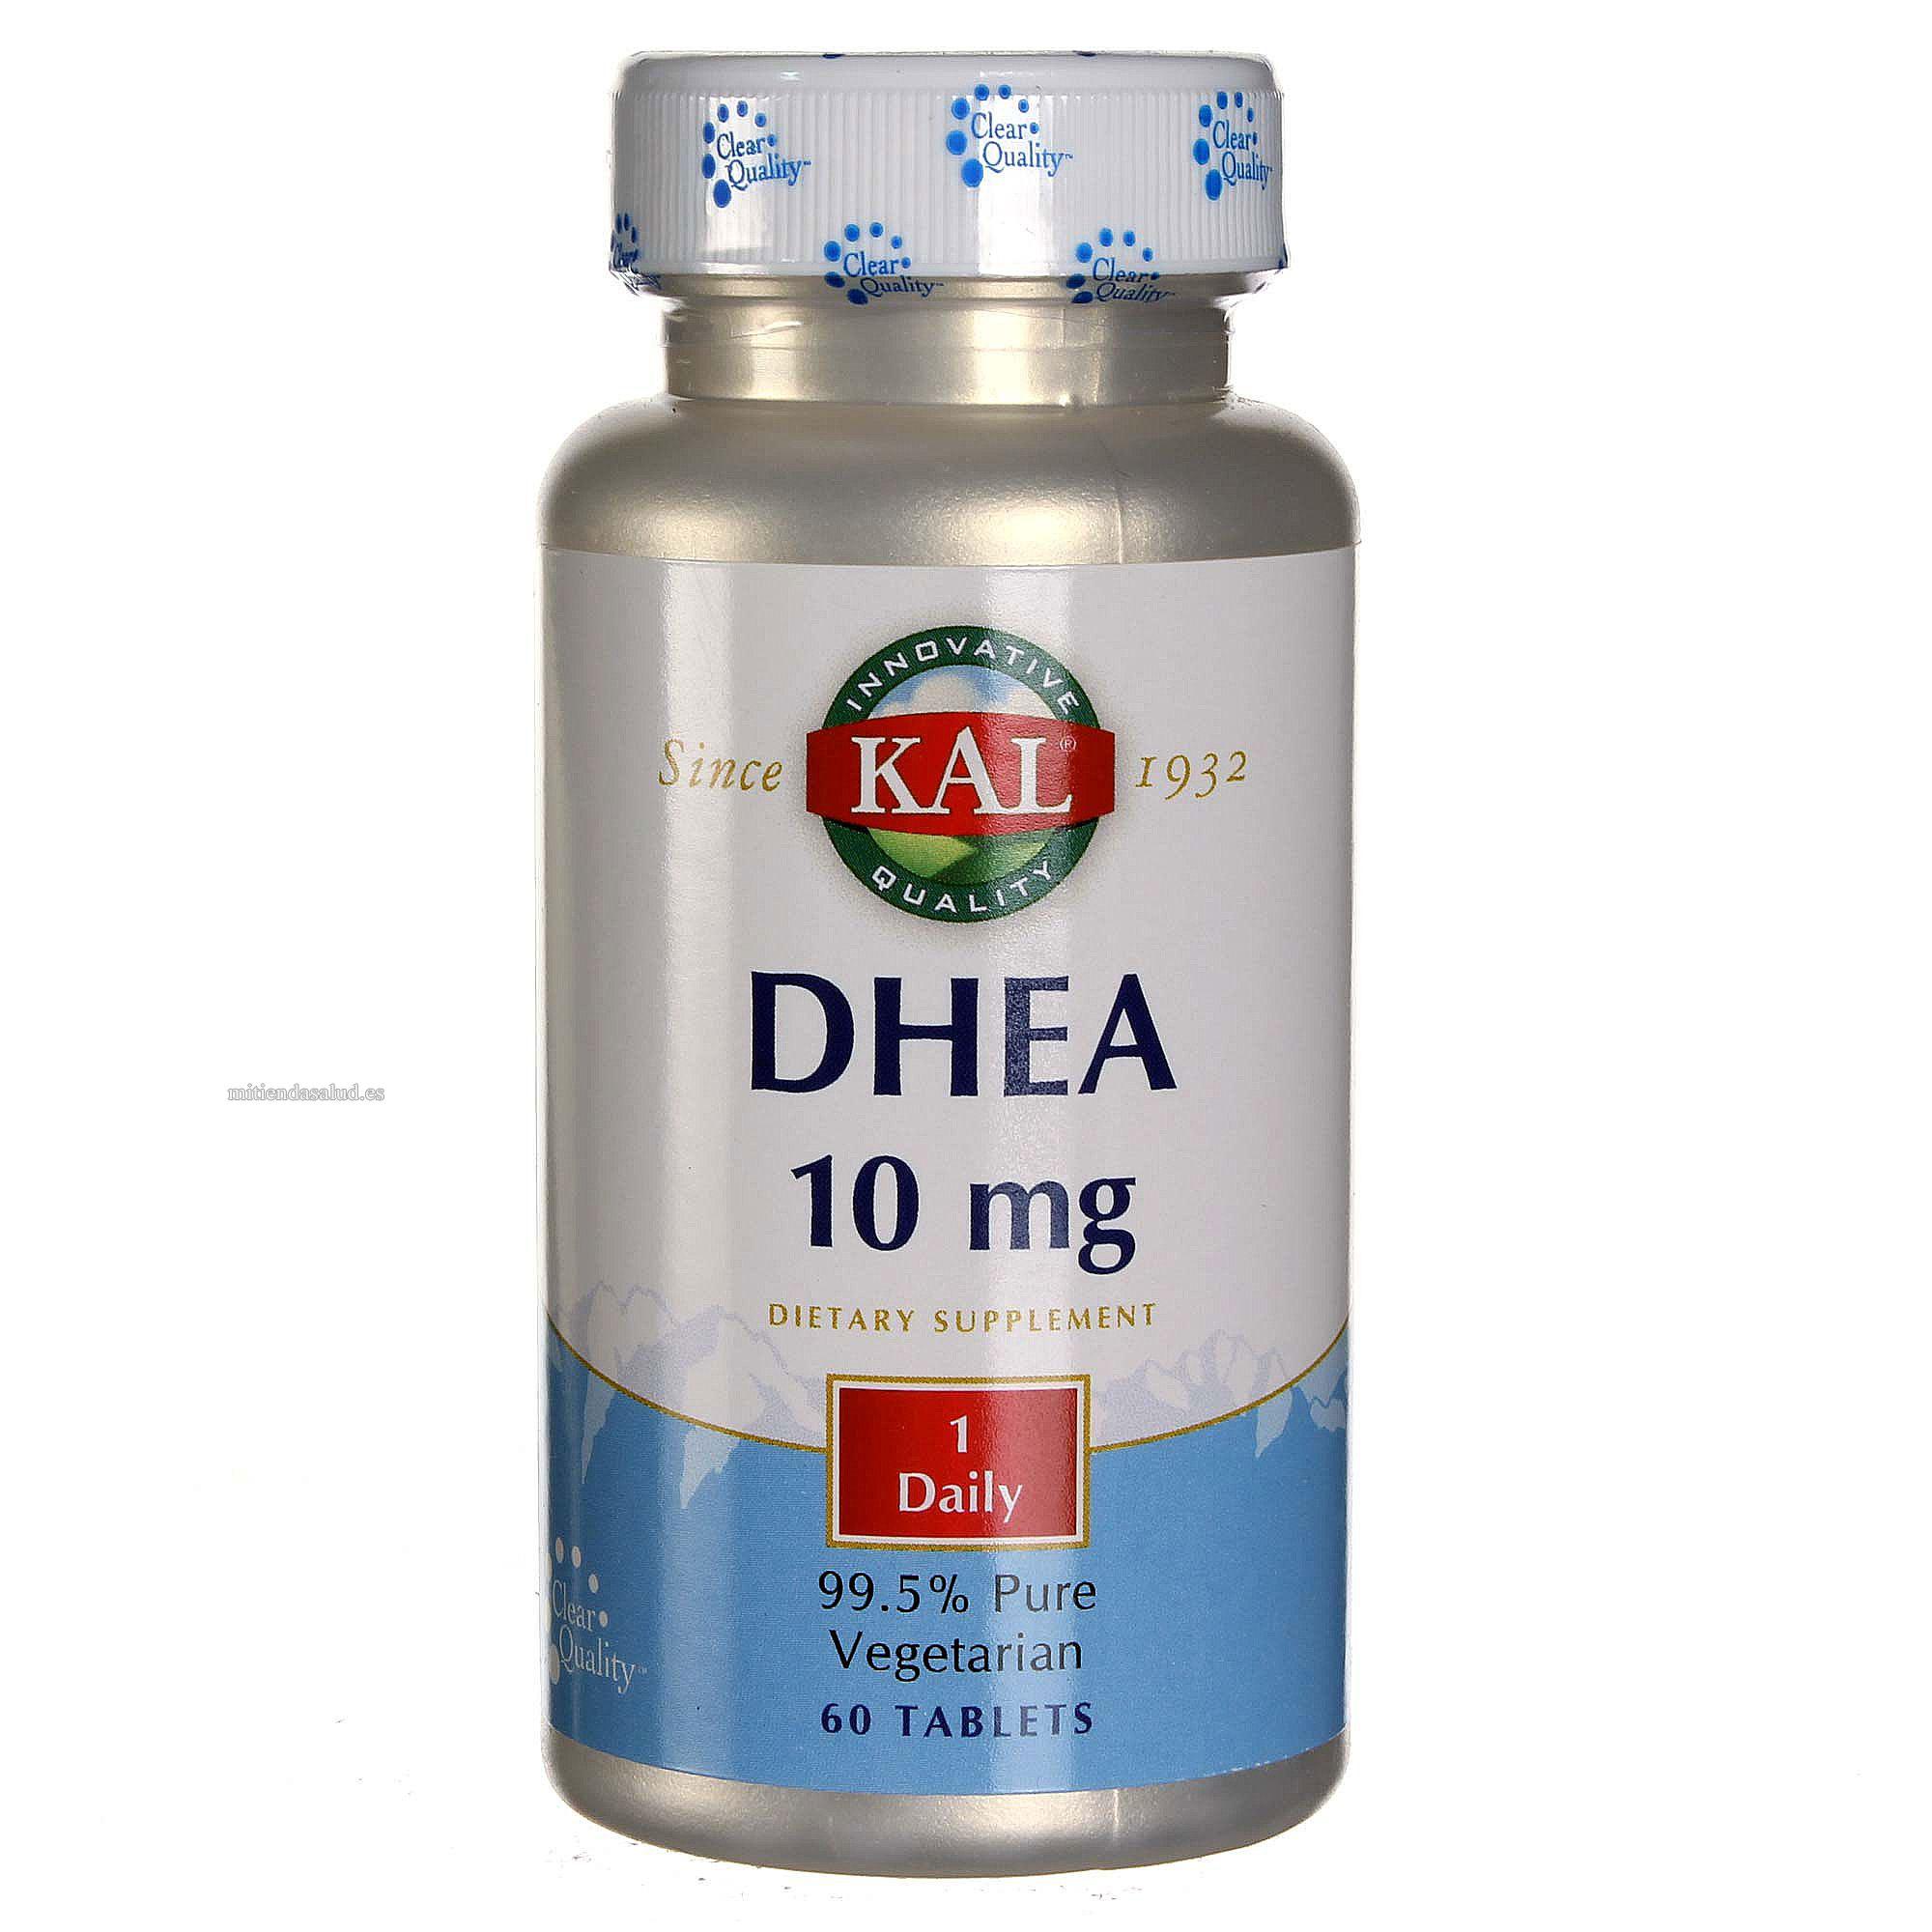 DHEA 10 mg Kal 60 tabletas